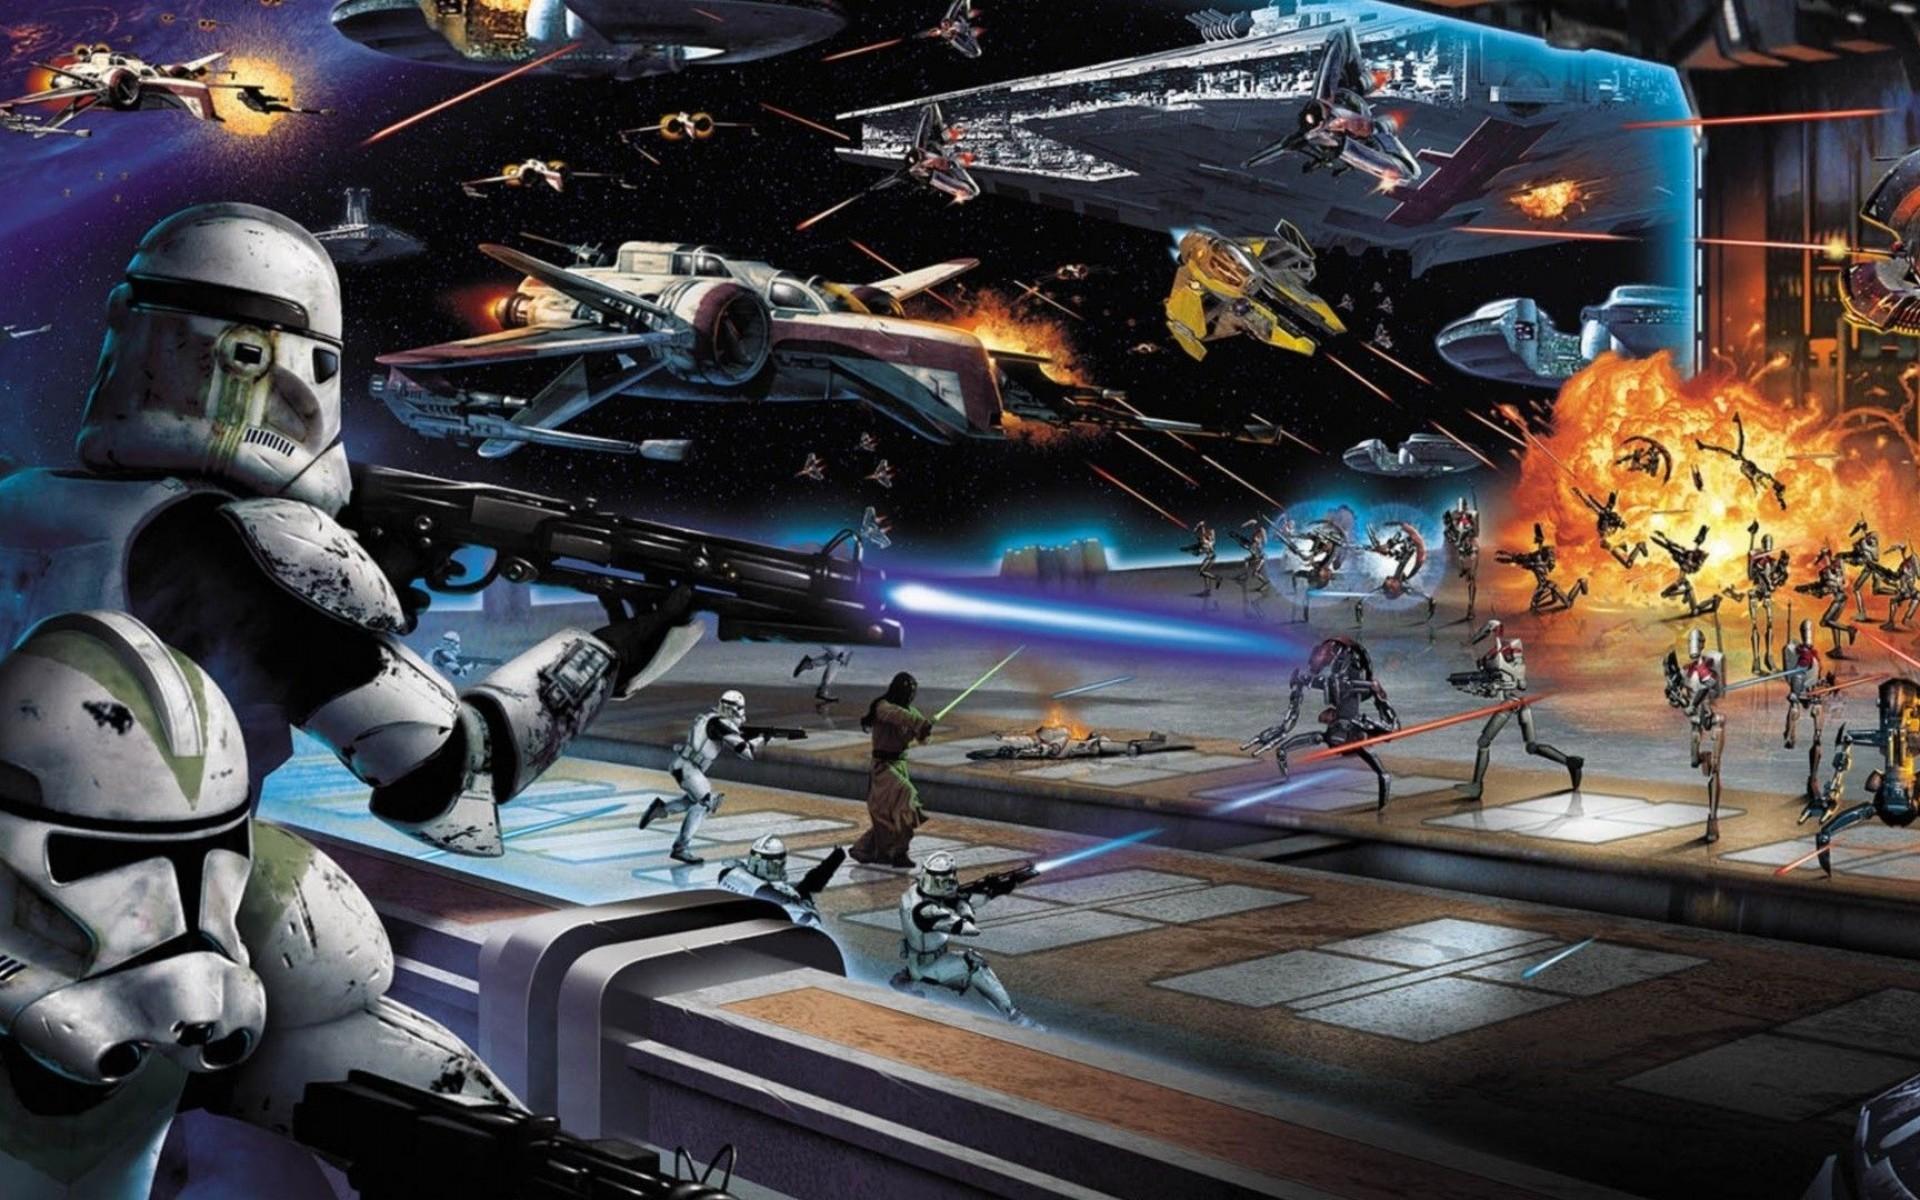 Star Wars Space Battle Wallpaper 61 images 1920x1200